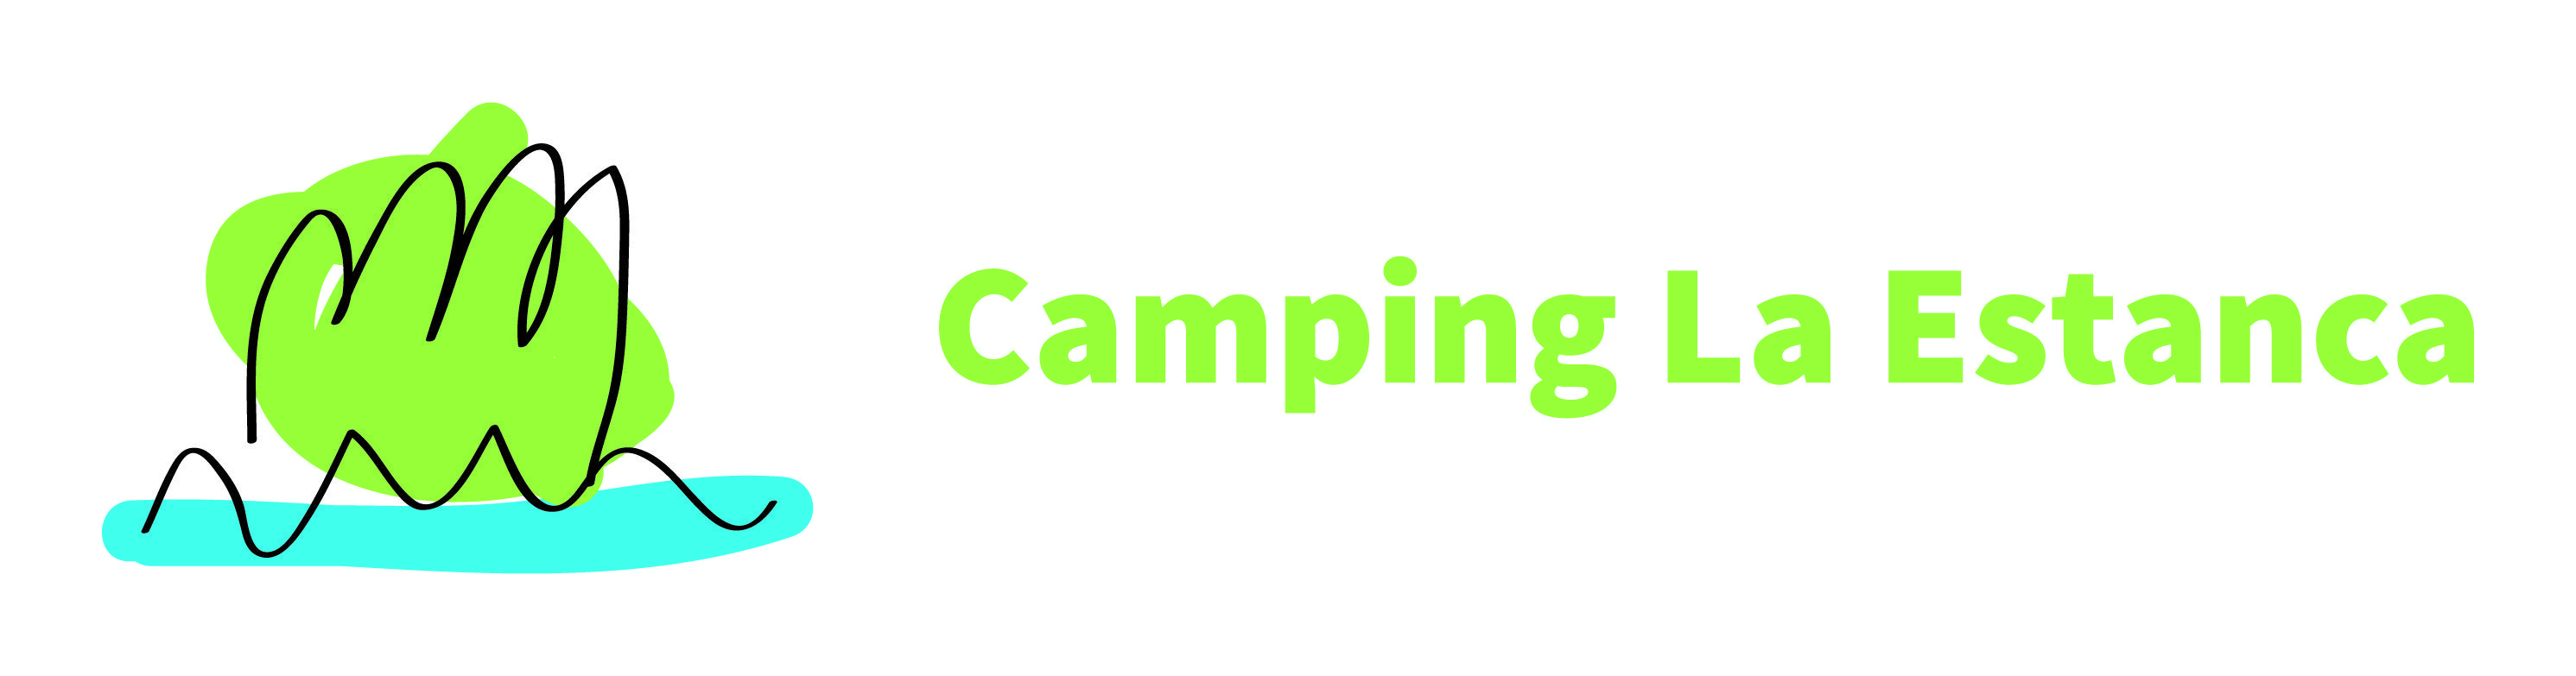 Camping La estanca